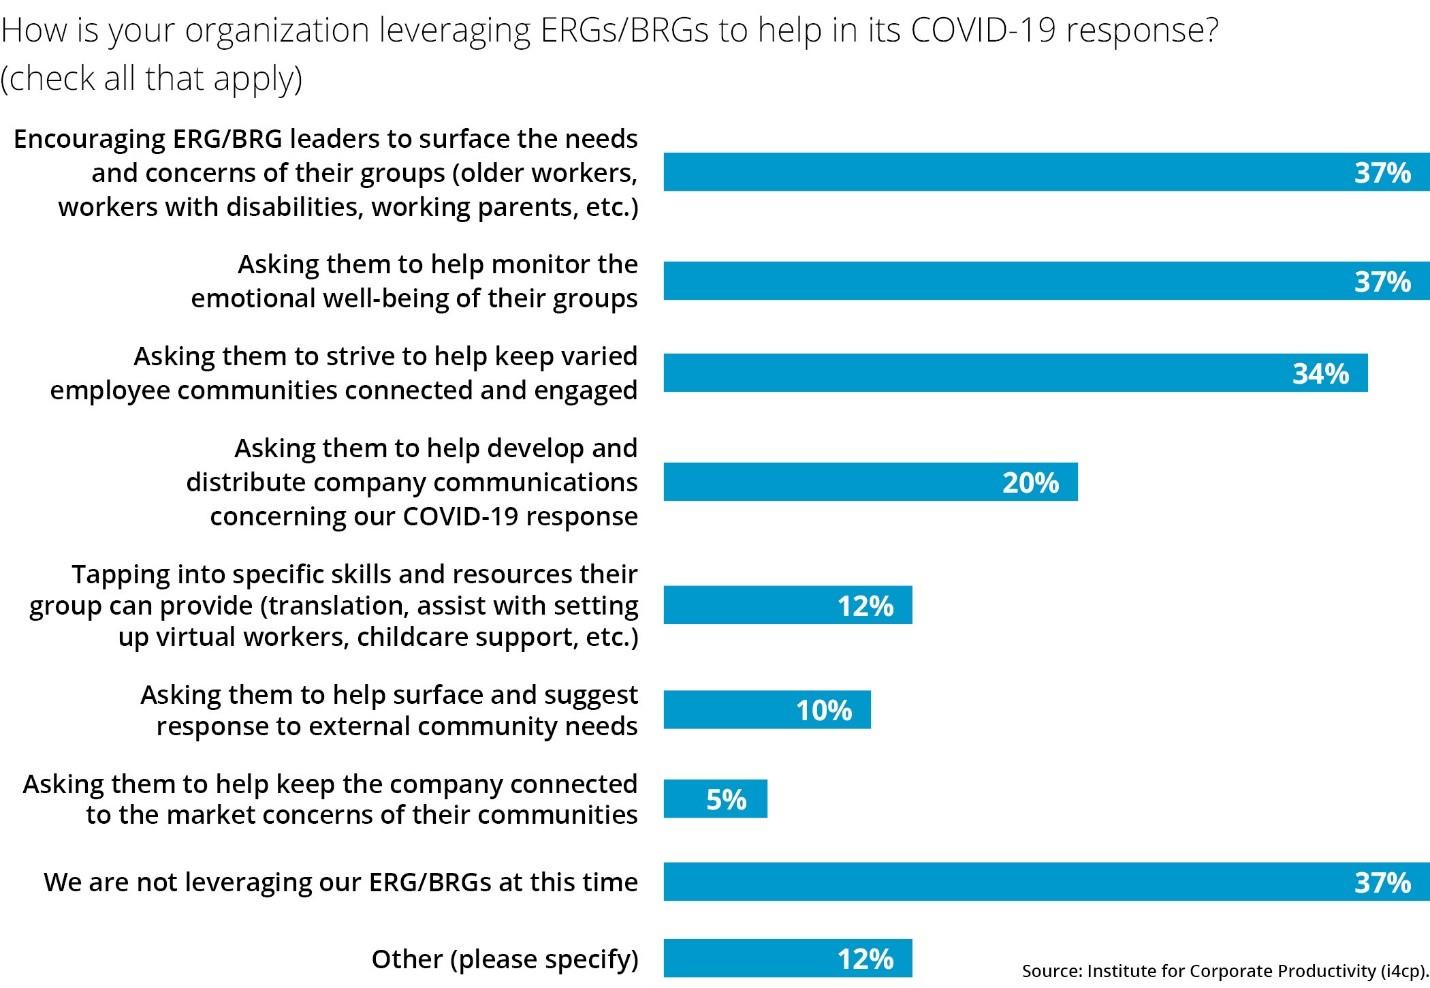 ERGBRG Covid 19 response